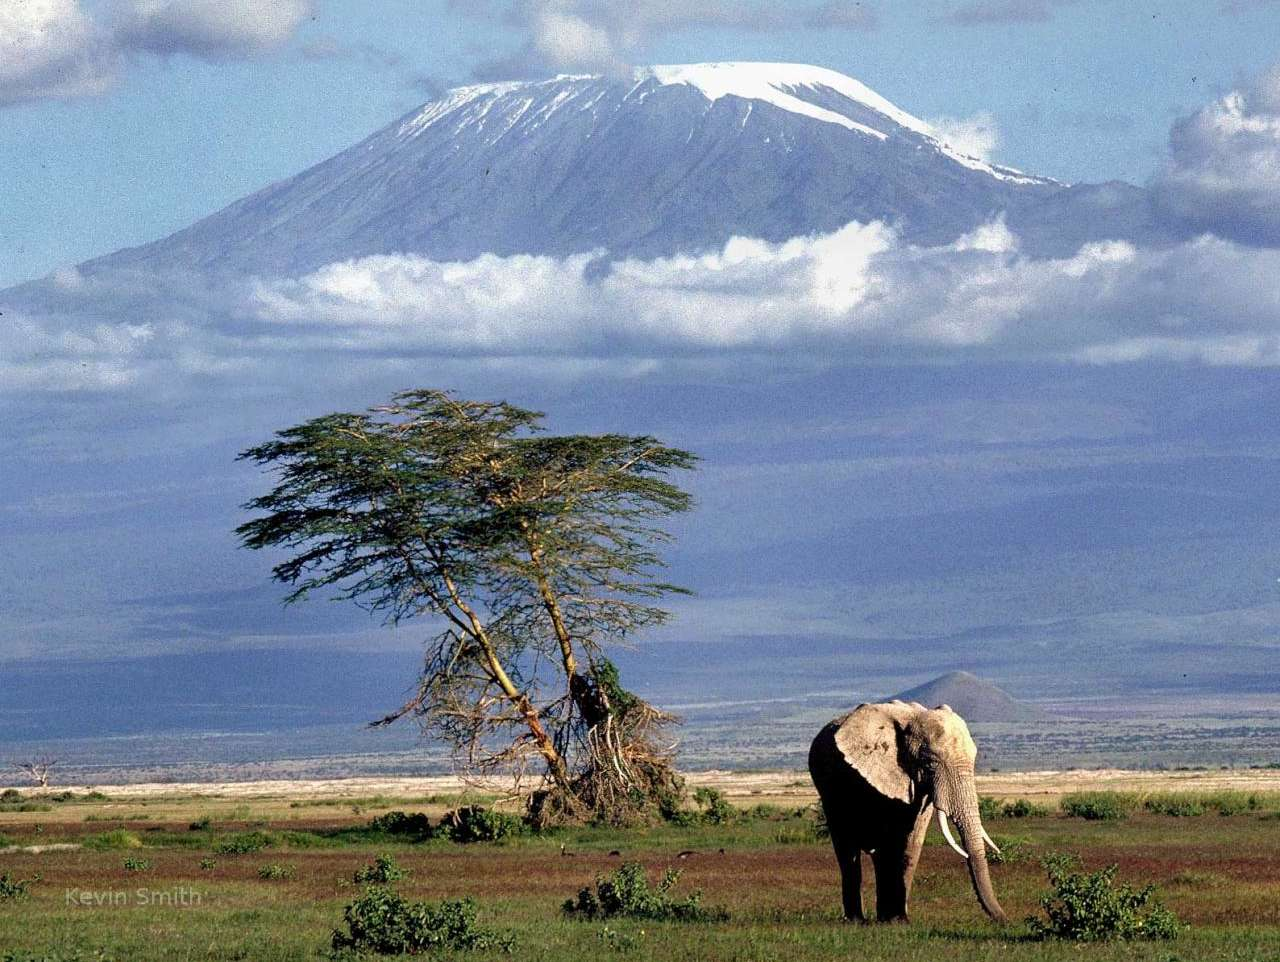 to visit Tanzania